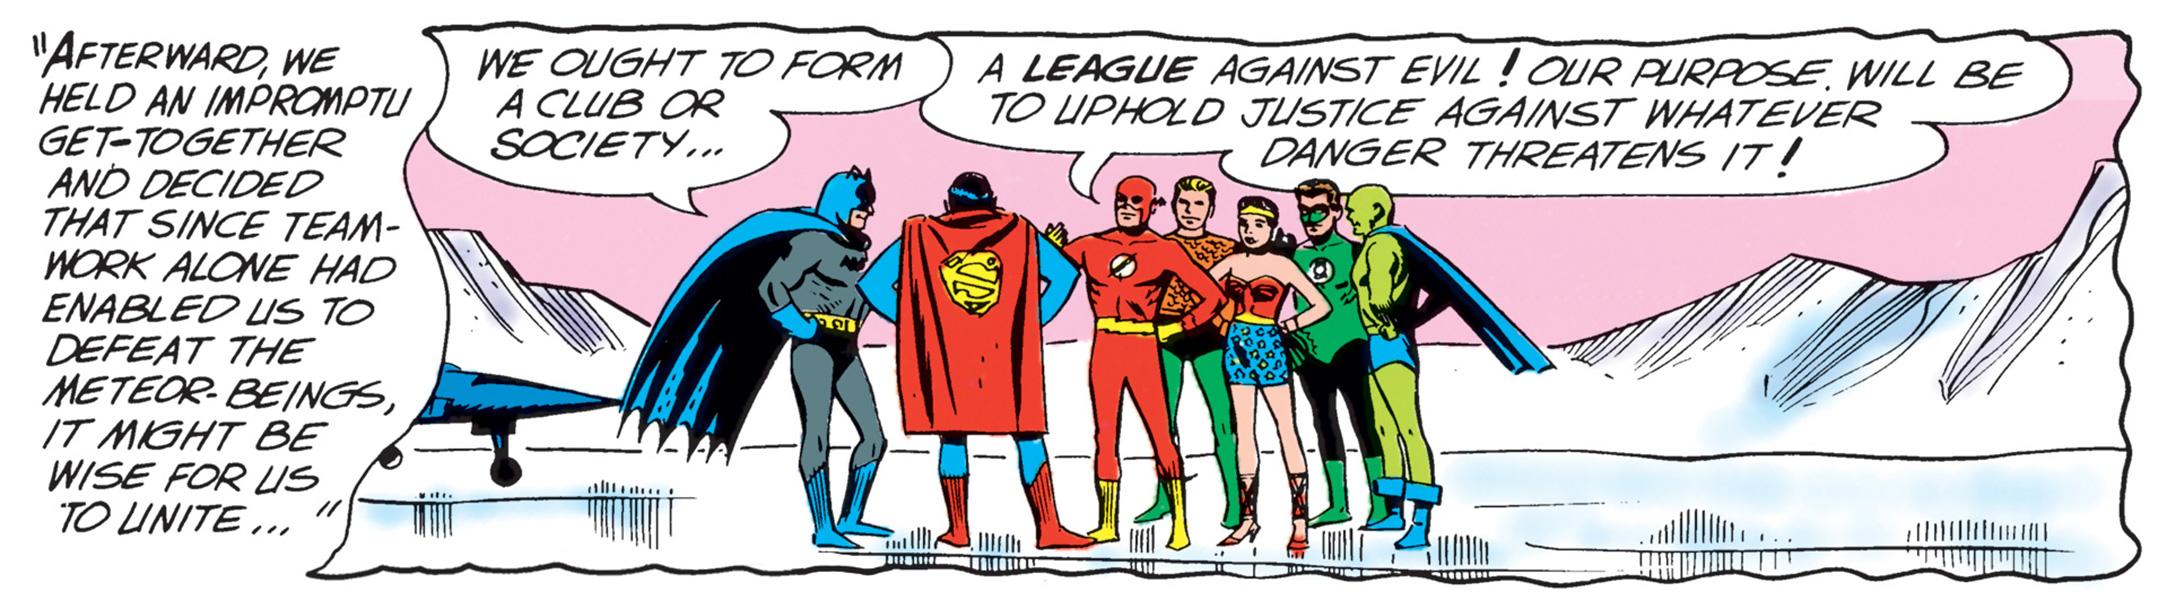 justiceleague-origin-JLA_9_p27-v1.jpg